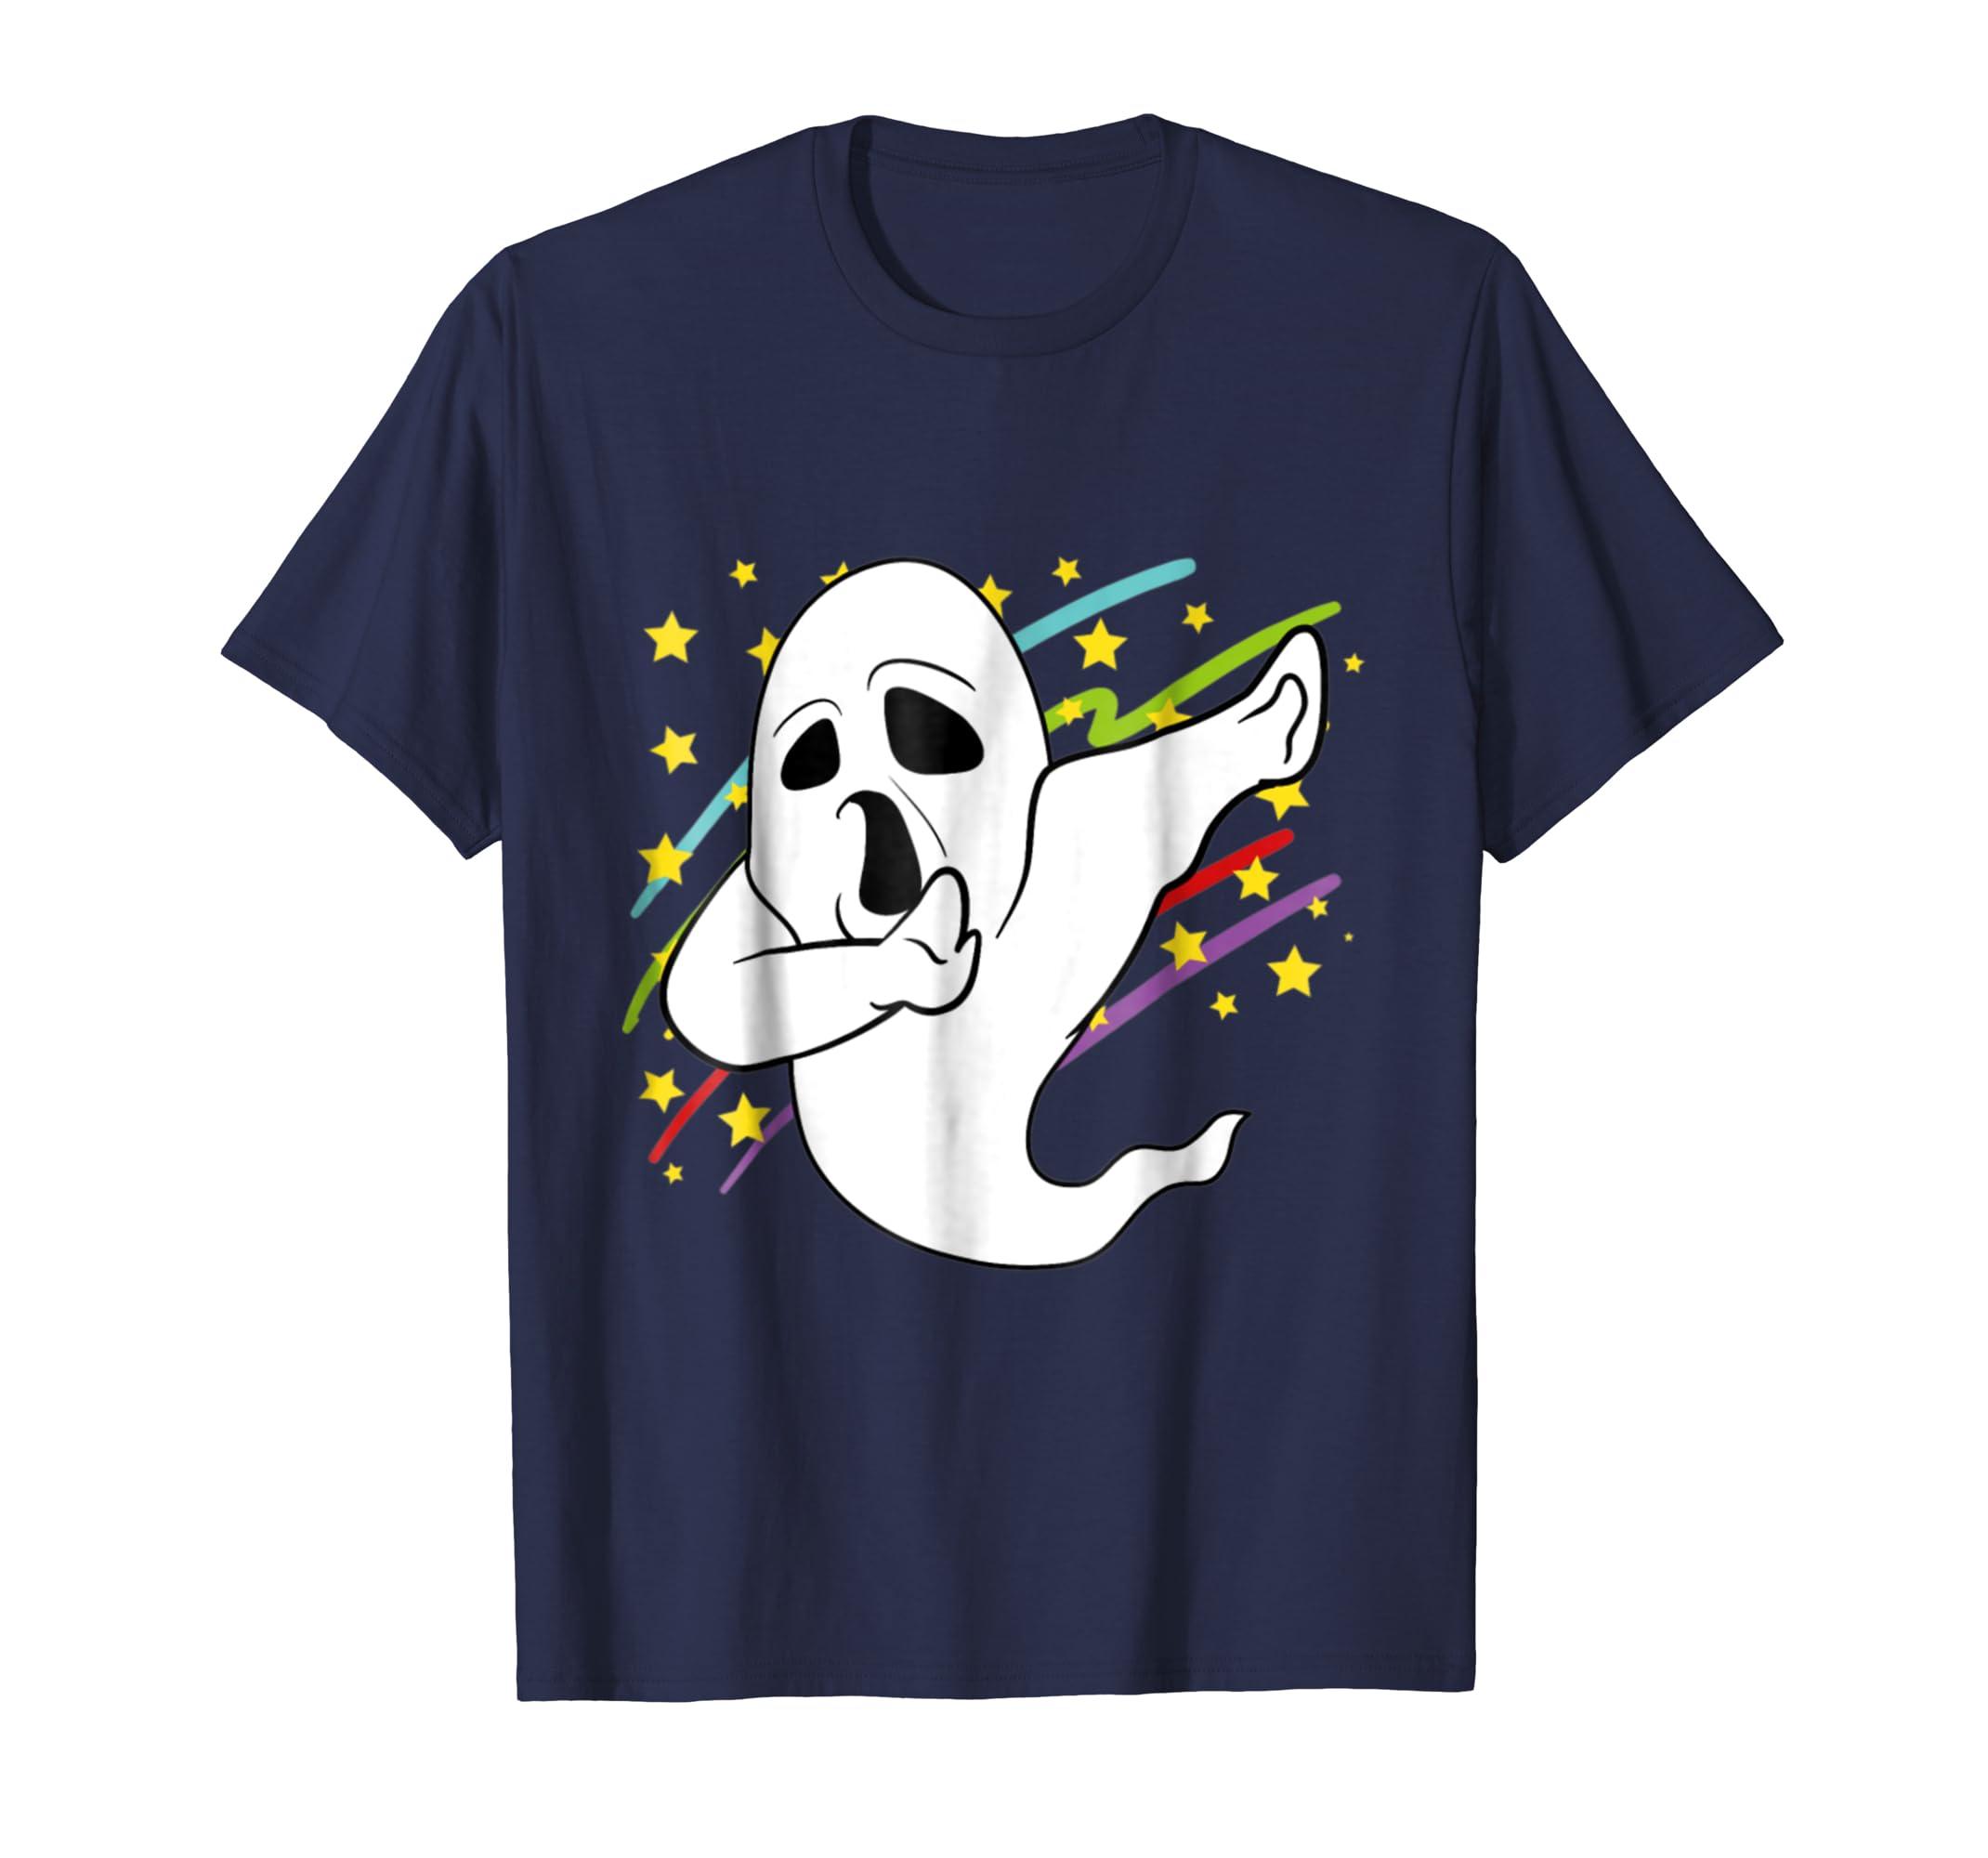 Dabbing Dab Ghost Halloween Disco Party Music shirt